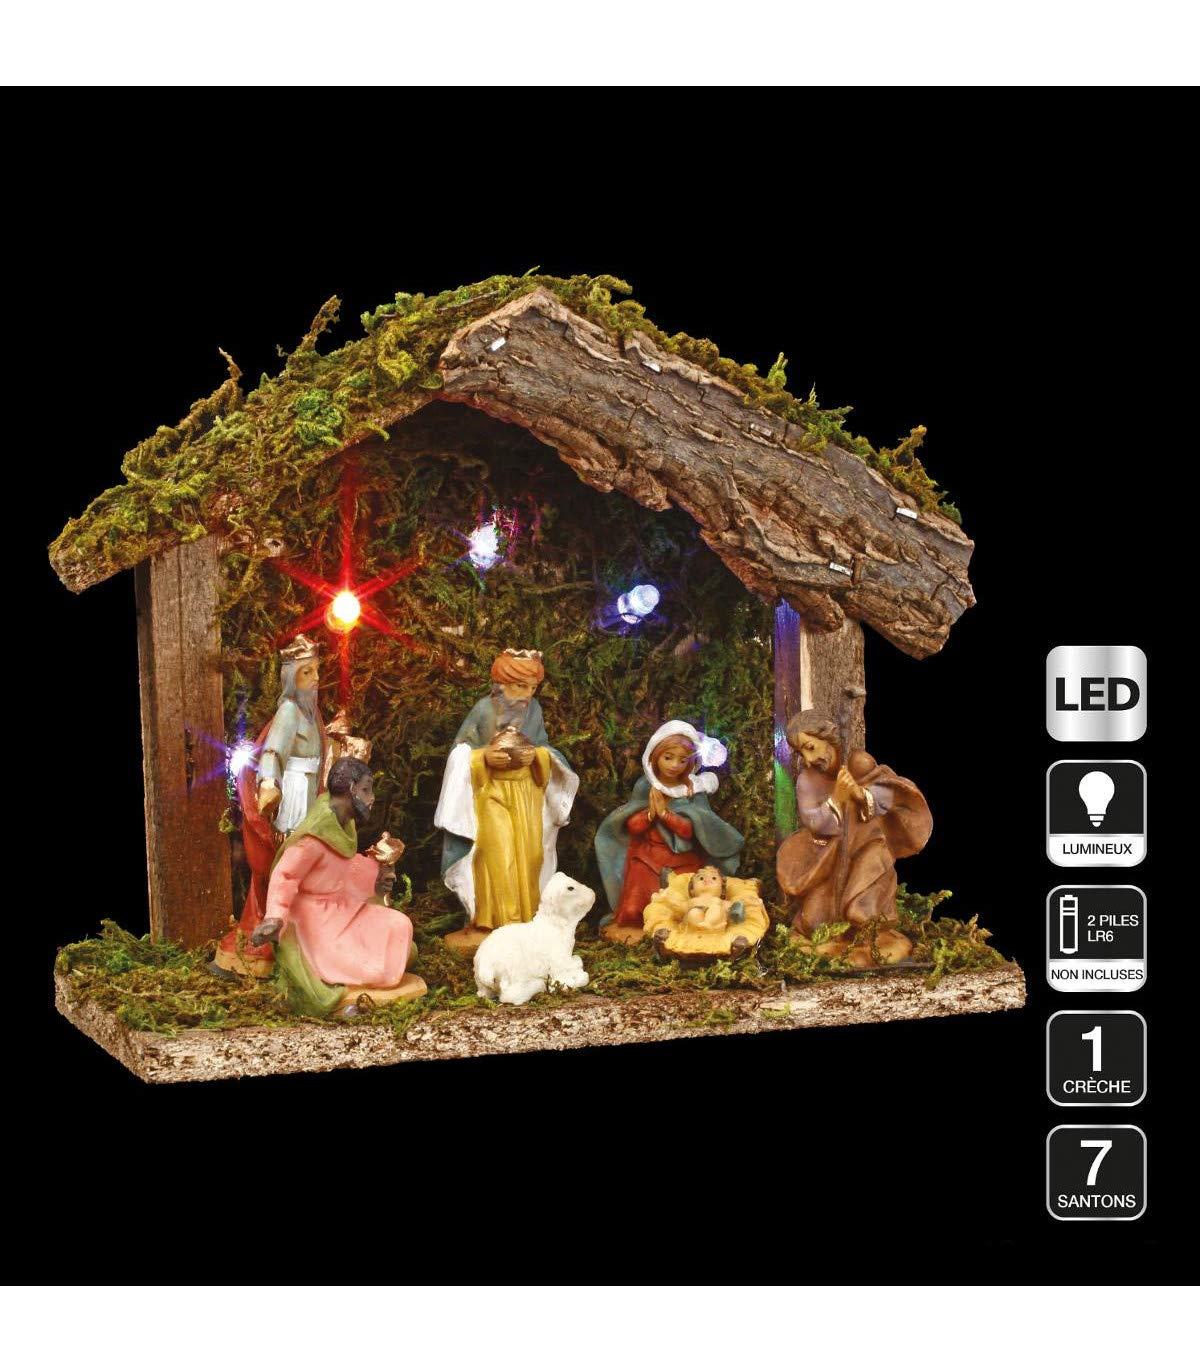 3 in 1 Christmas decoration : 1 Nativity scene + 7 figurines + LED lighting